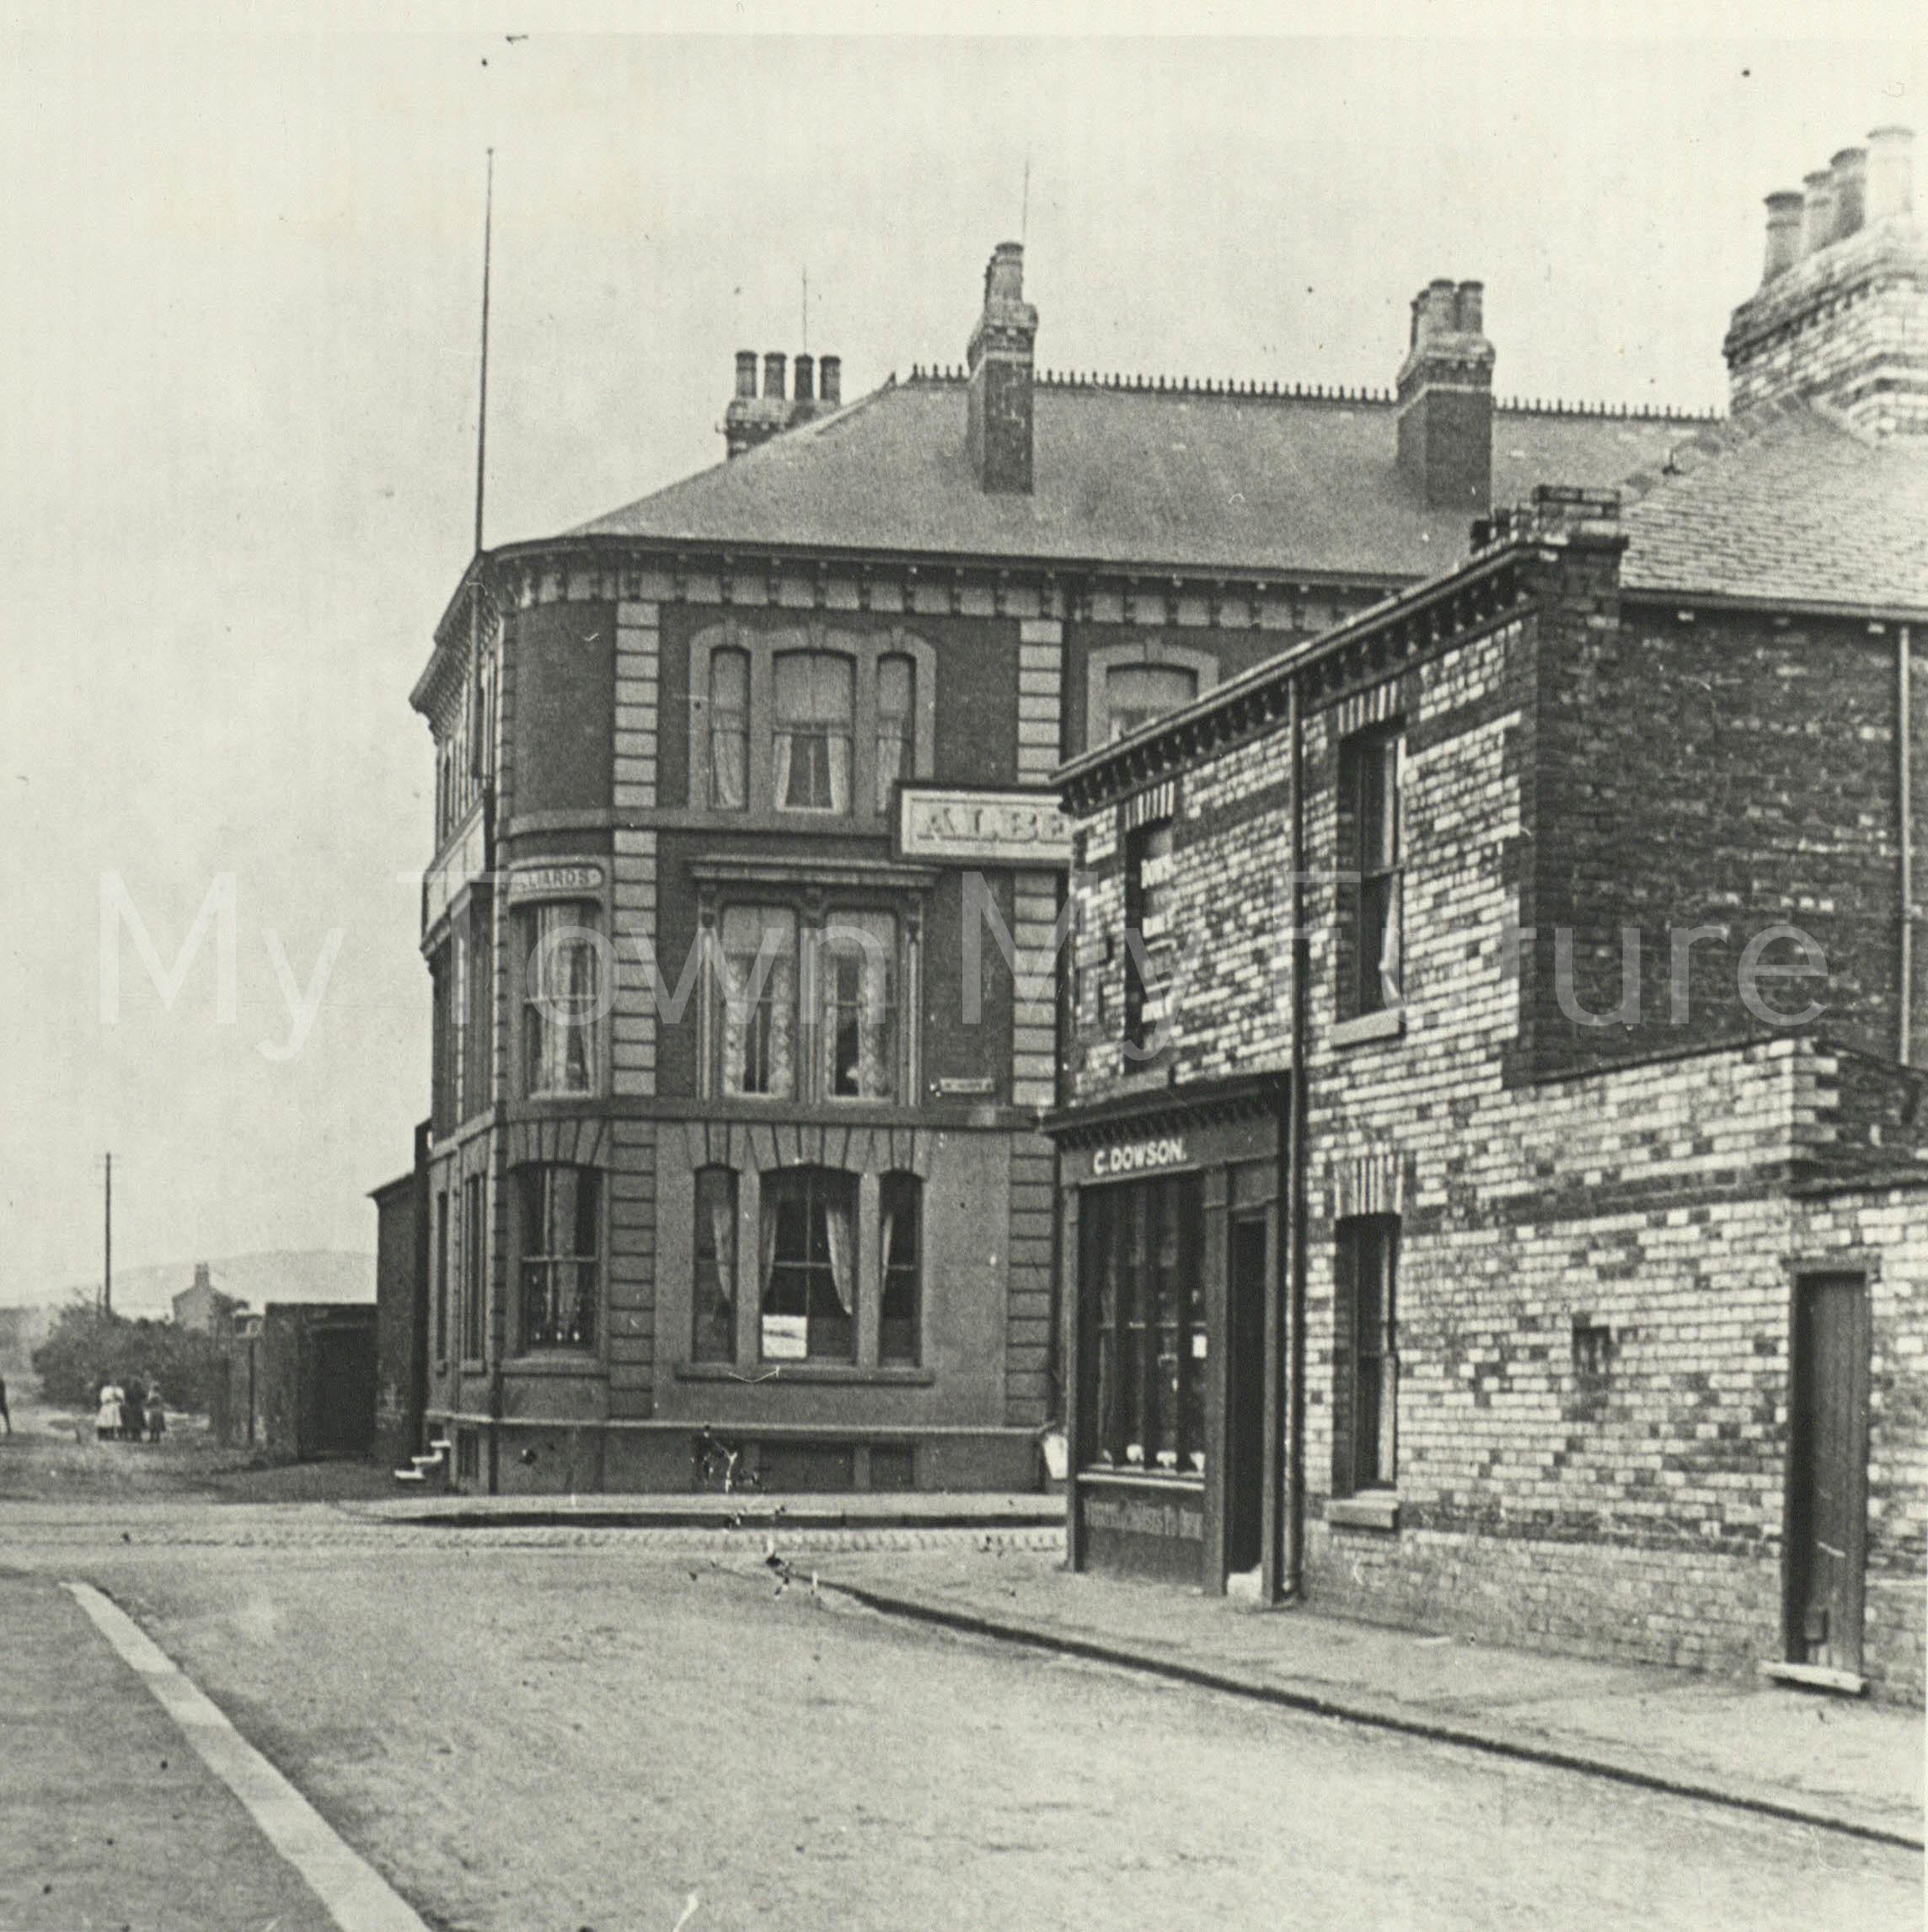 Albert Park Hotel Linthorpe Road opened 1871 now closed c1900